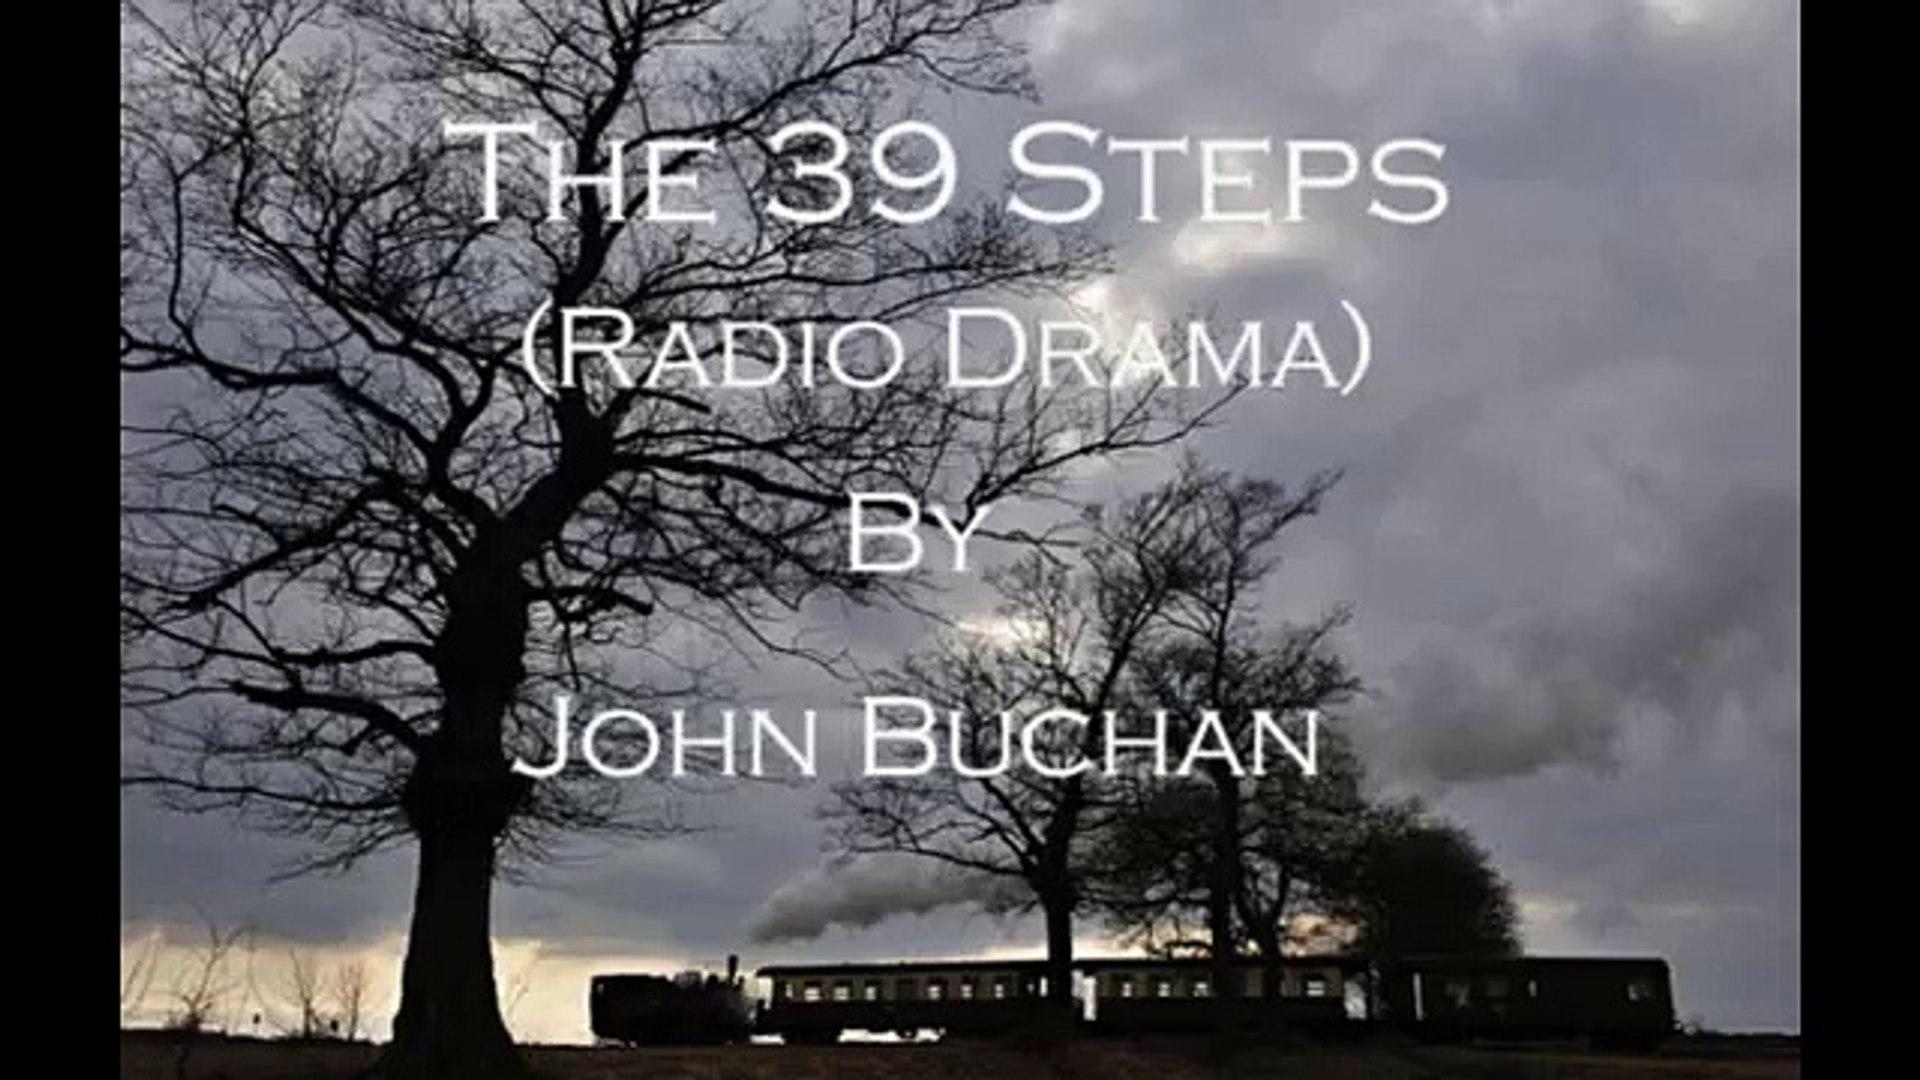 The 39 Steps (Radio Drama) Part 1 Of 2 - Starring David Robb Tom Baker